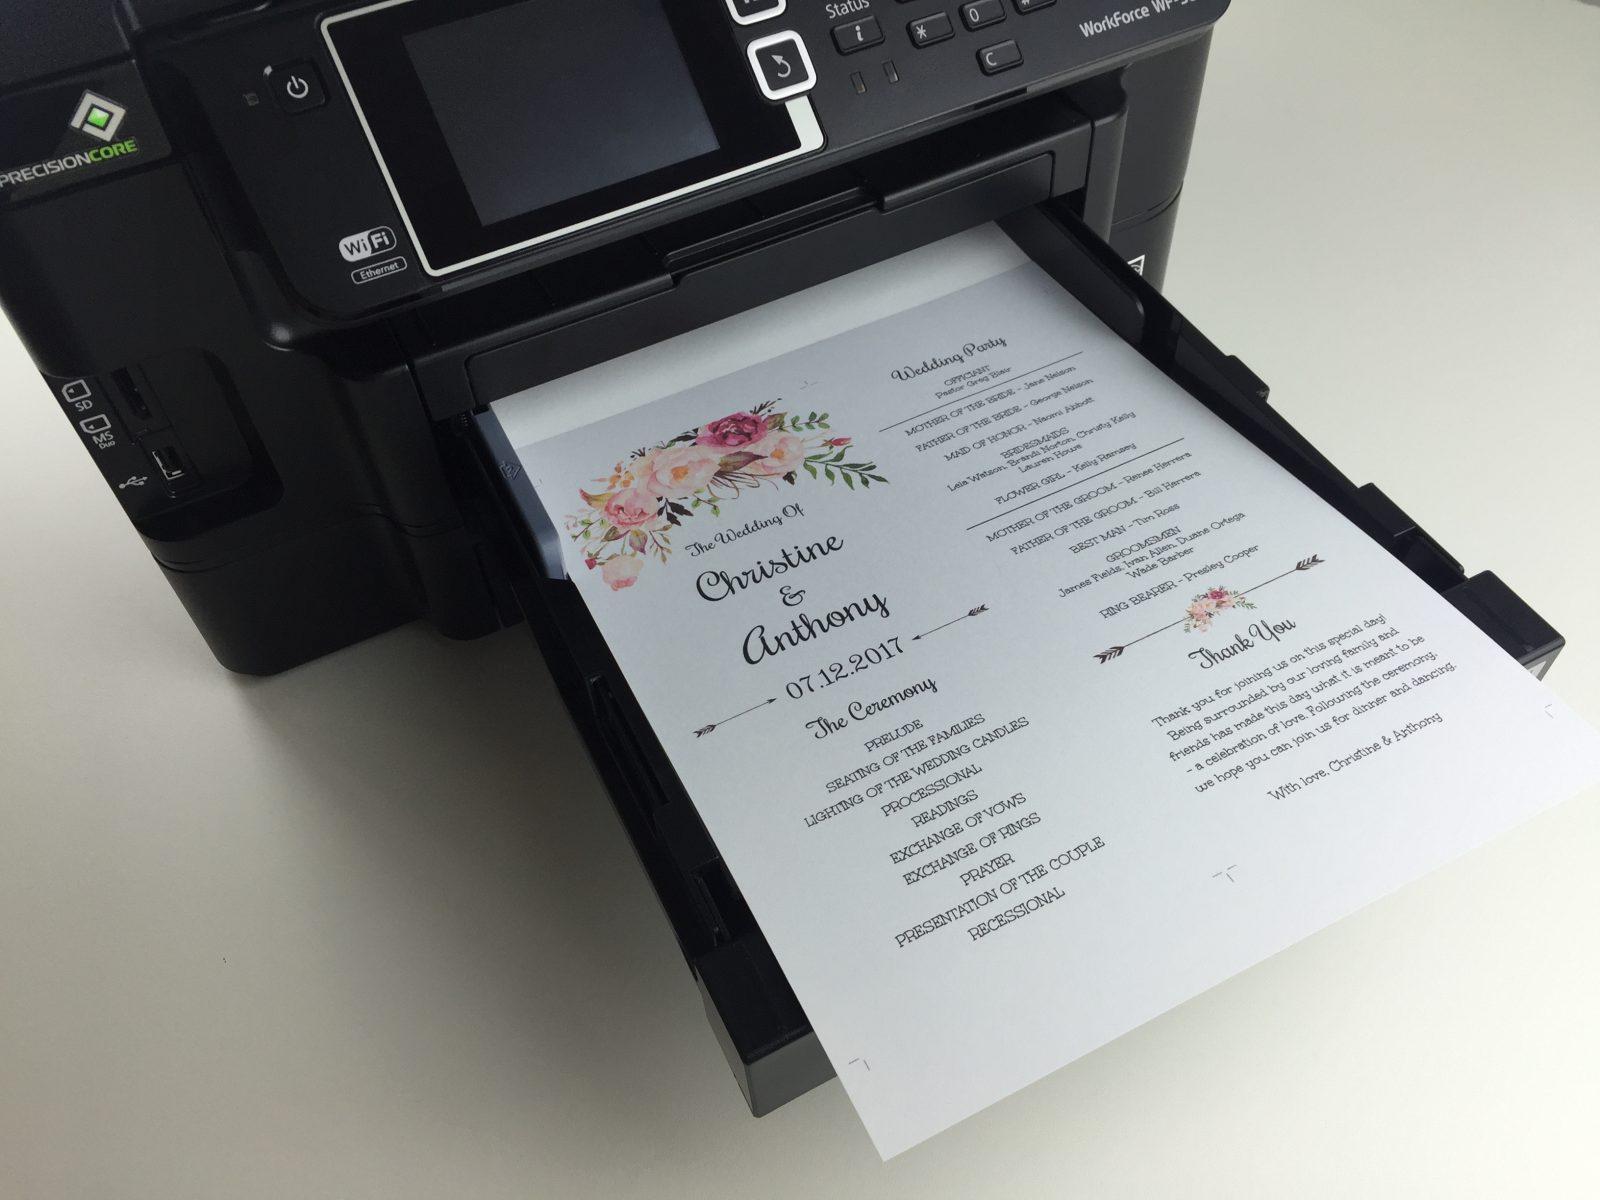 Insert back into printer 1